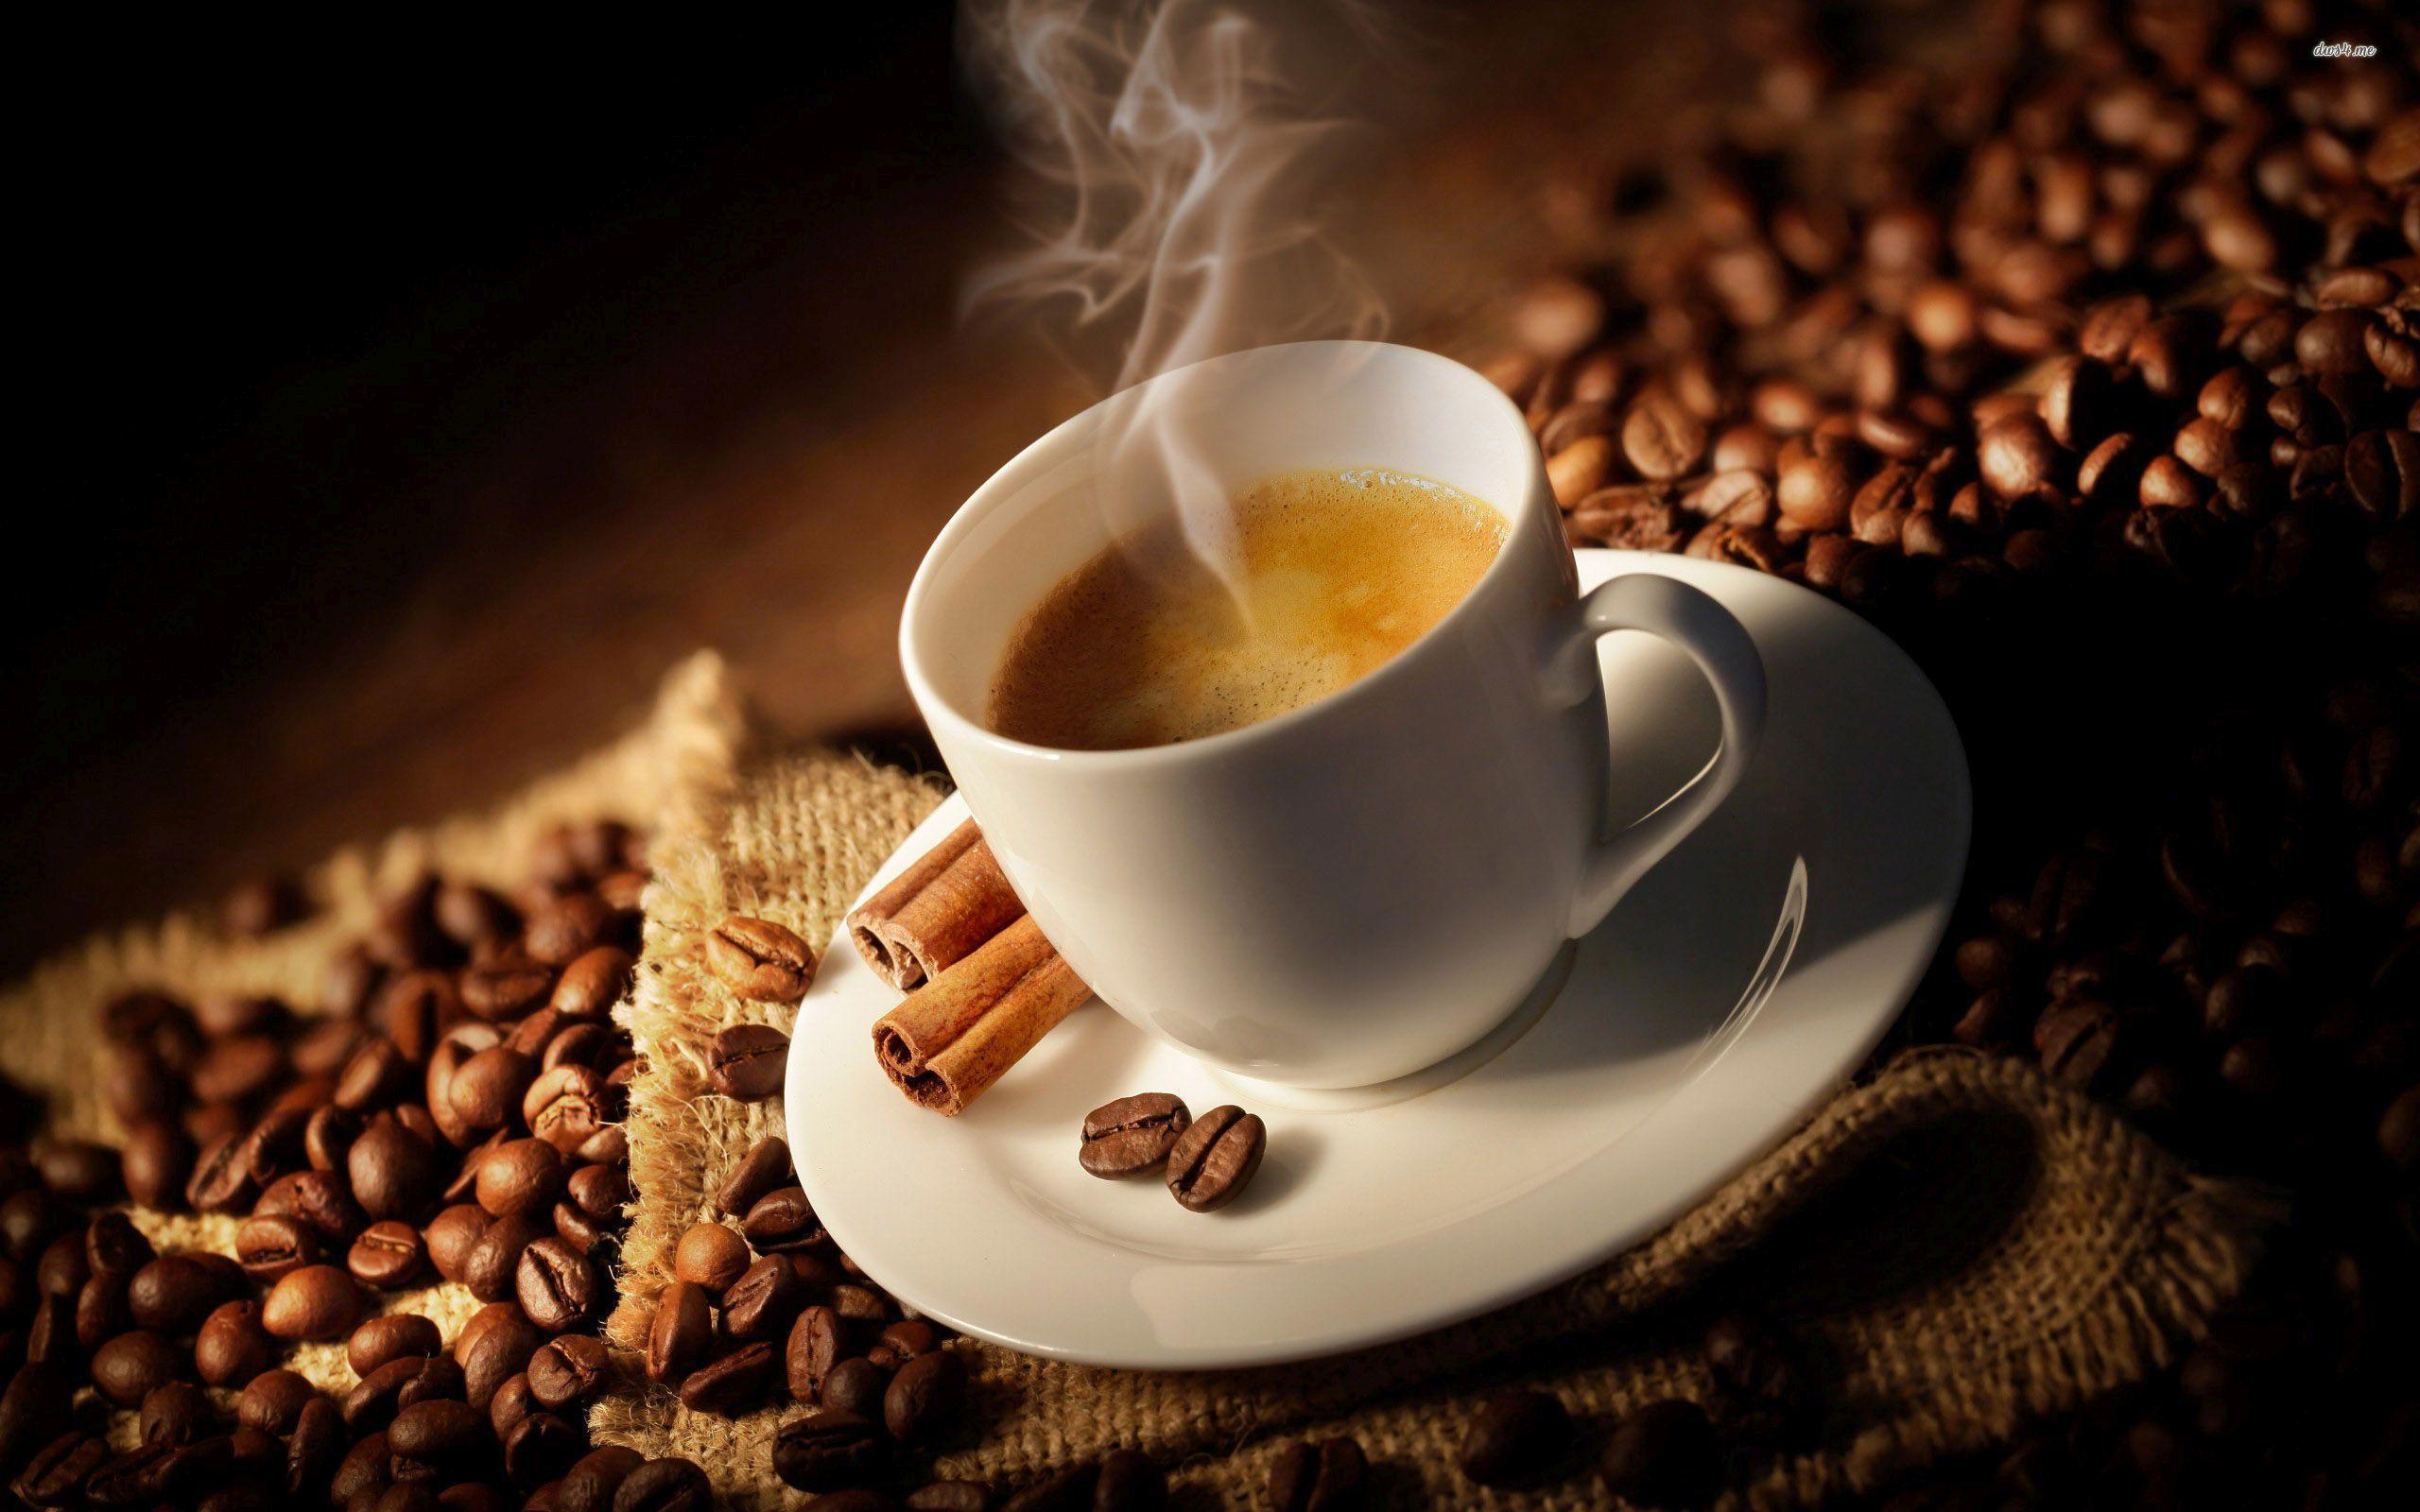 Coffee Desktop Wallpapers - Top Free Coffee Desktop ...